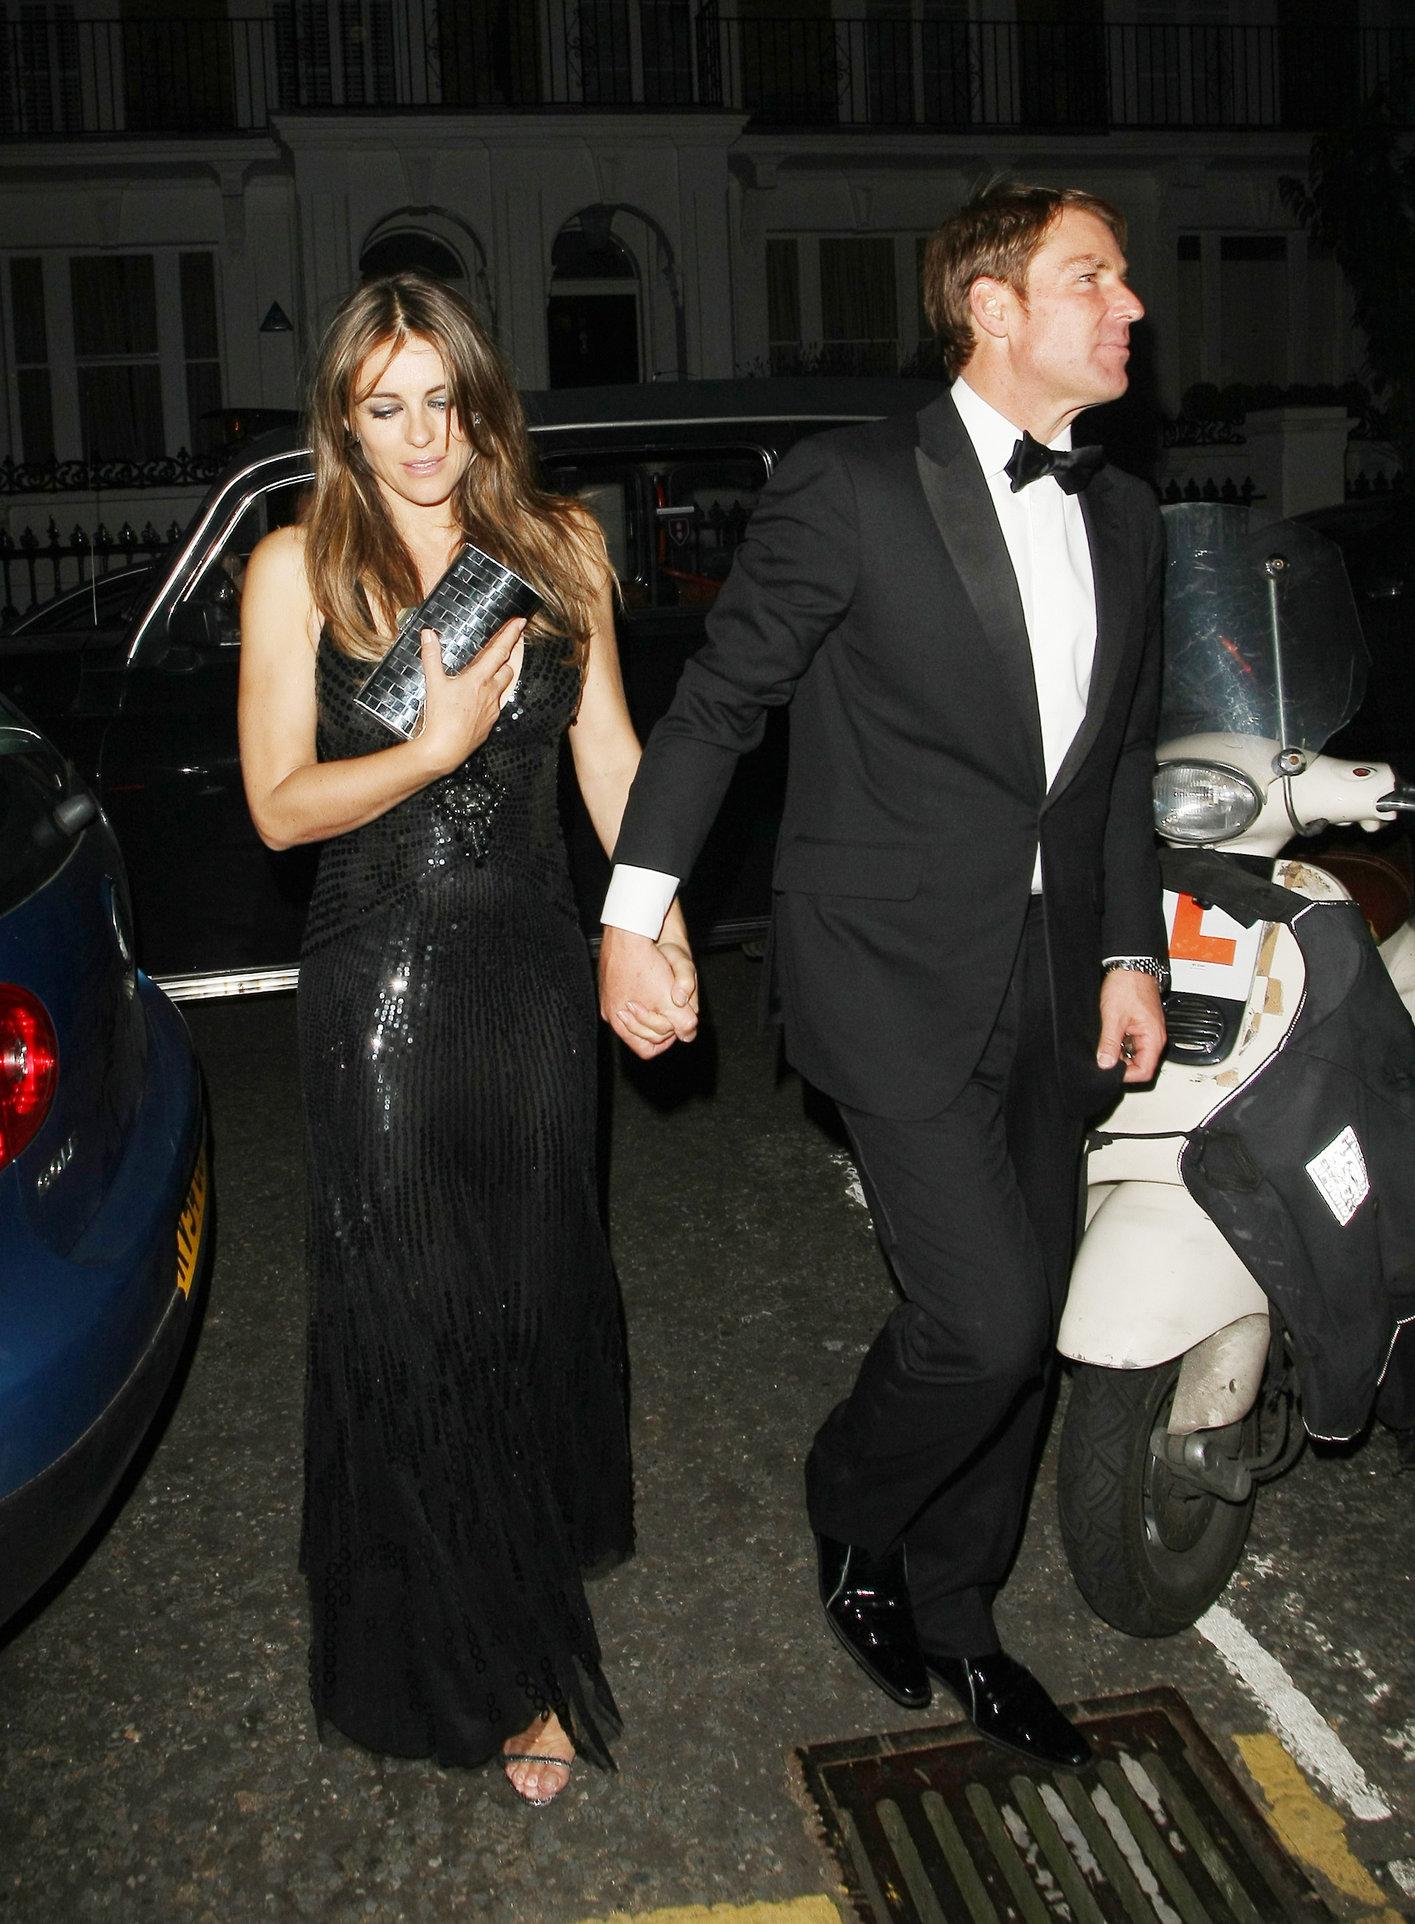 Elizabeth Hurley - Attending a friend's birthday party in London - July 5, 2012